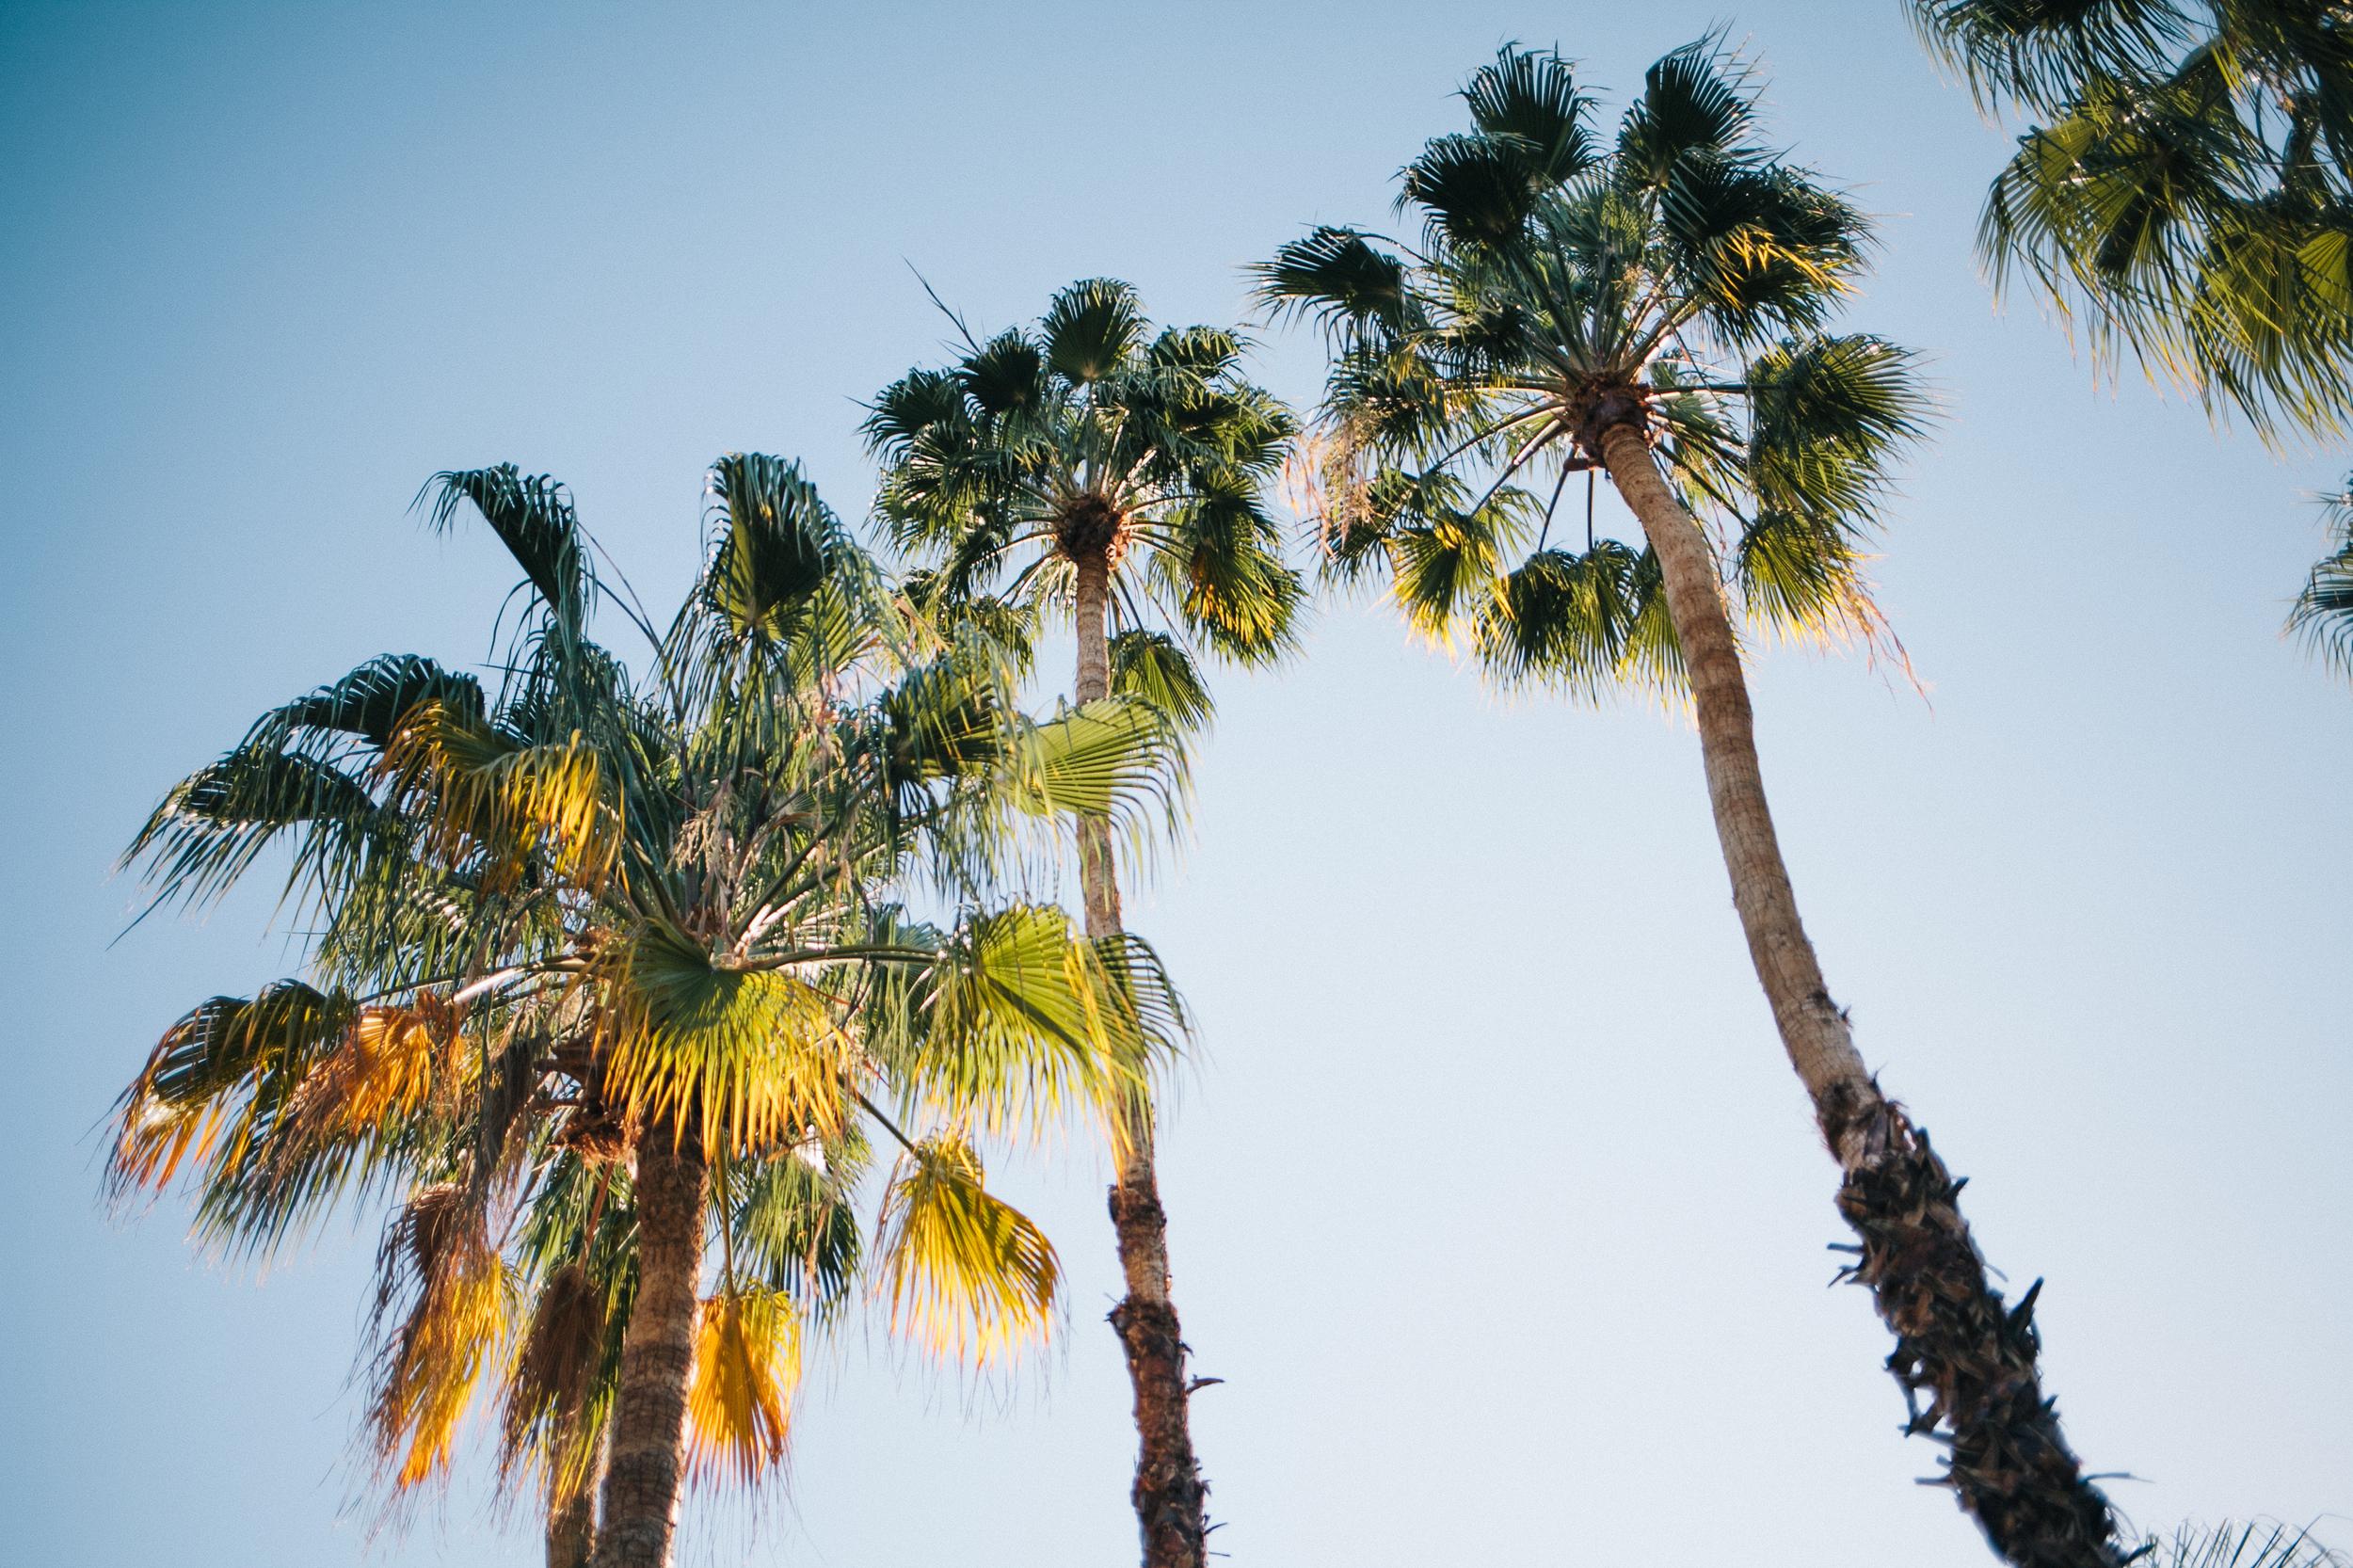 Palm Springs Tress by Naomi Yamada